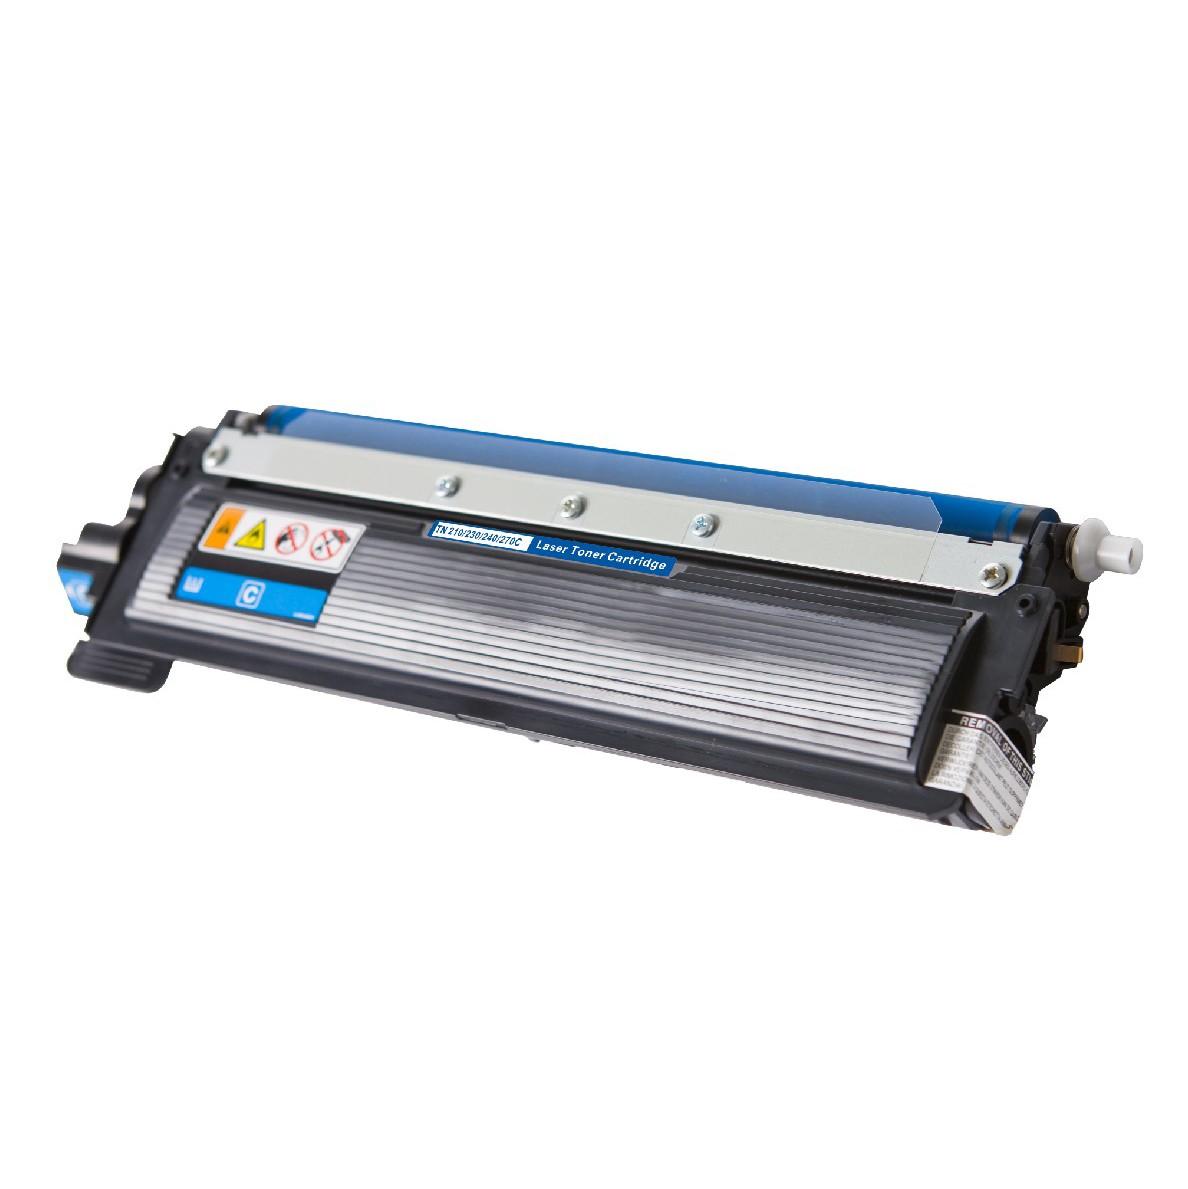 Brother TN270 C Lasertoner, Cyan, kompatibel (1400 sider)